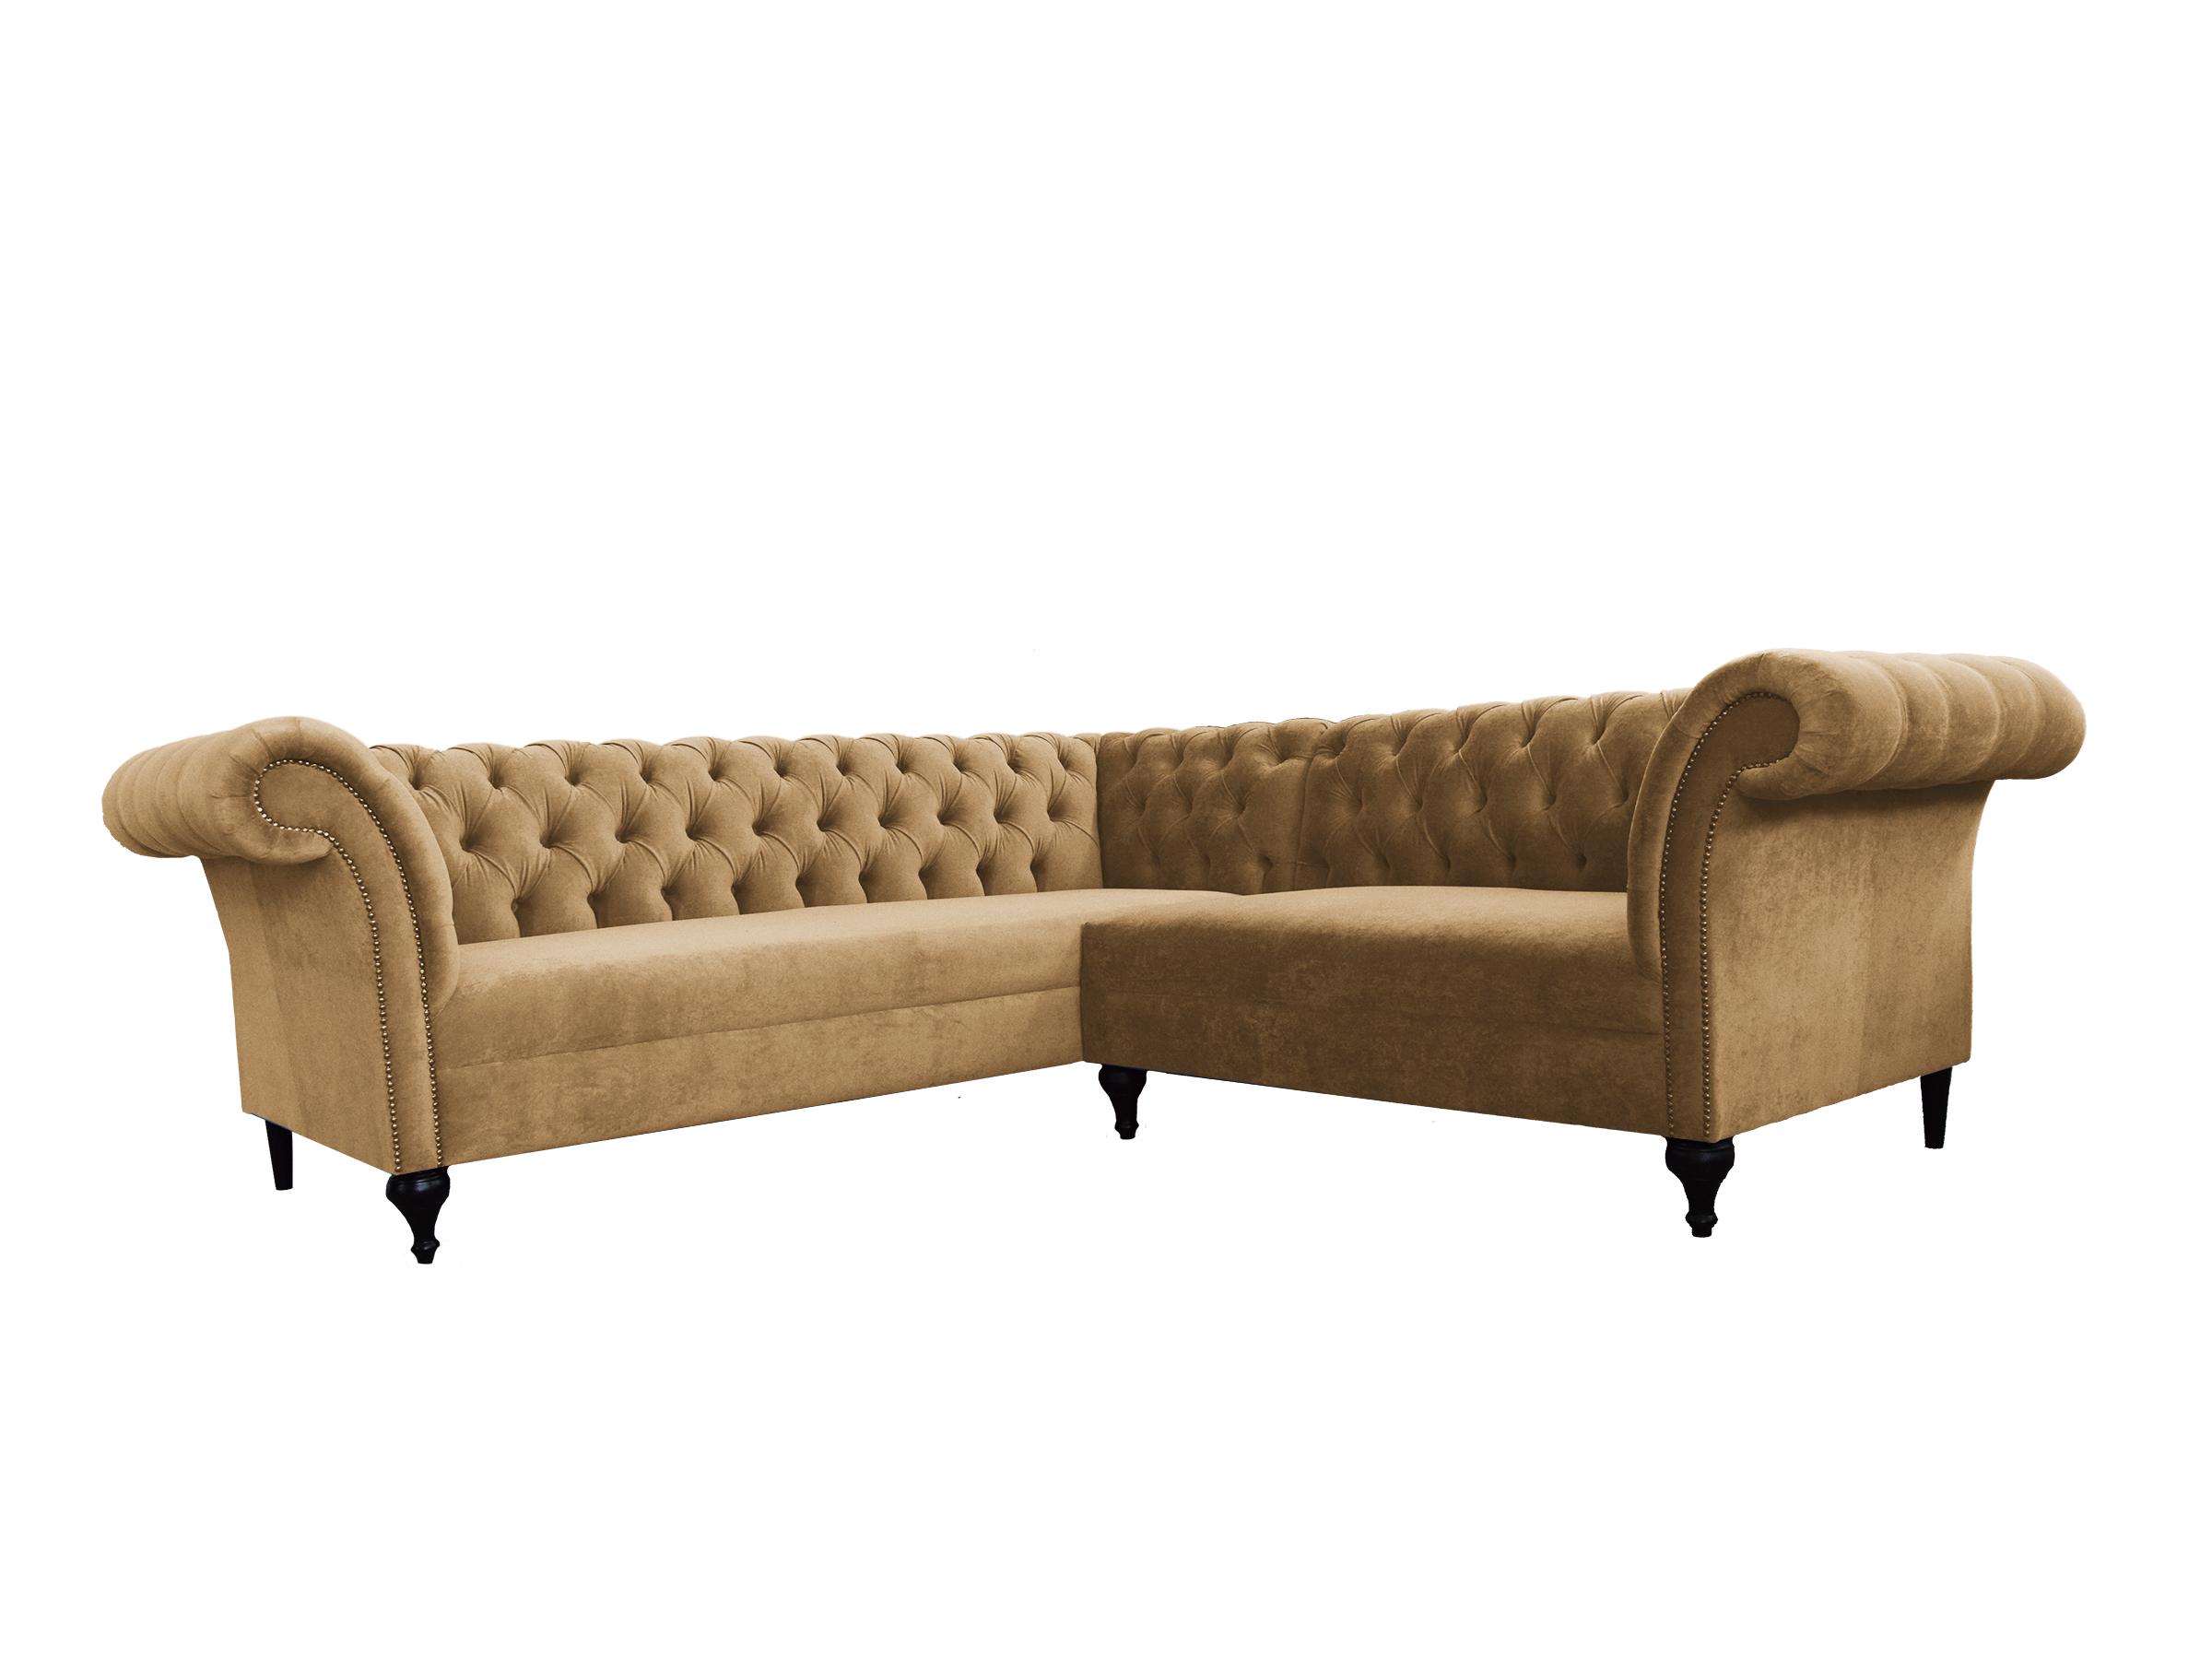 Chesterfield ecksofa eckcouch designer sofa couch samt for Ecksofa 2 60x2 00